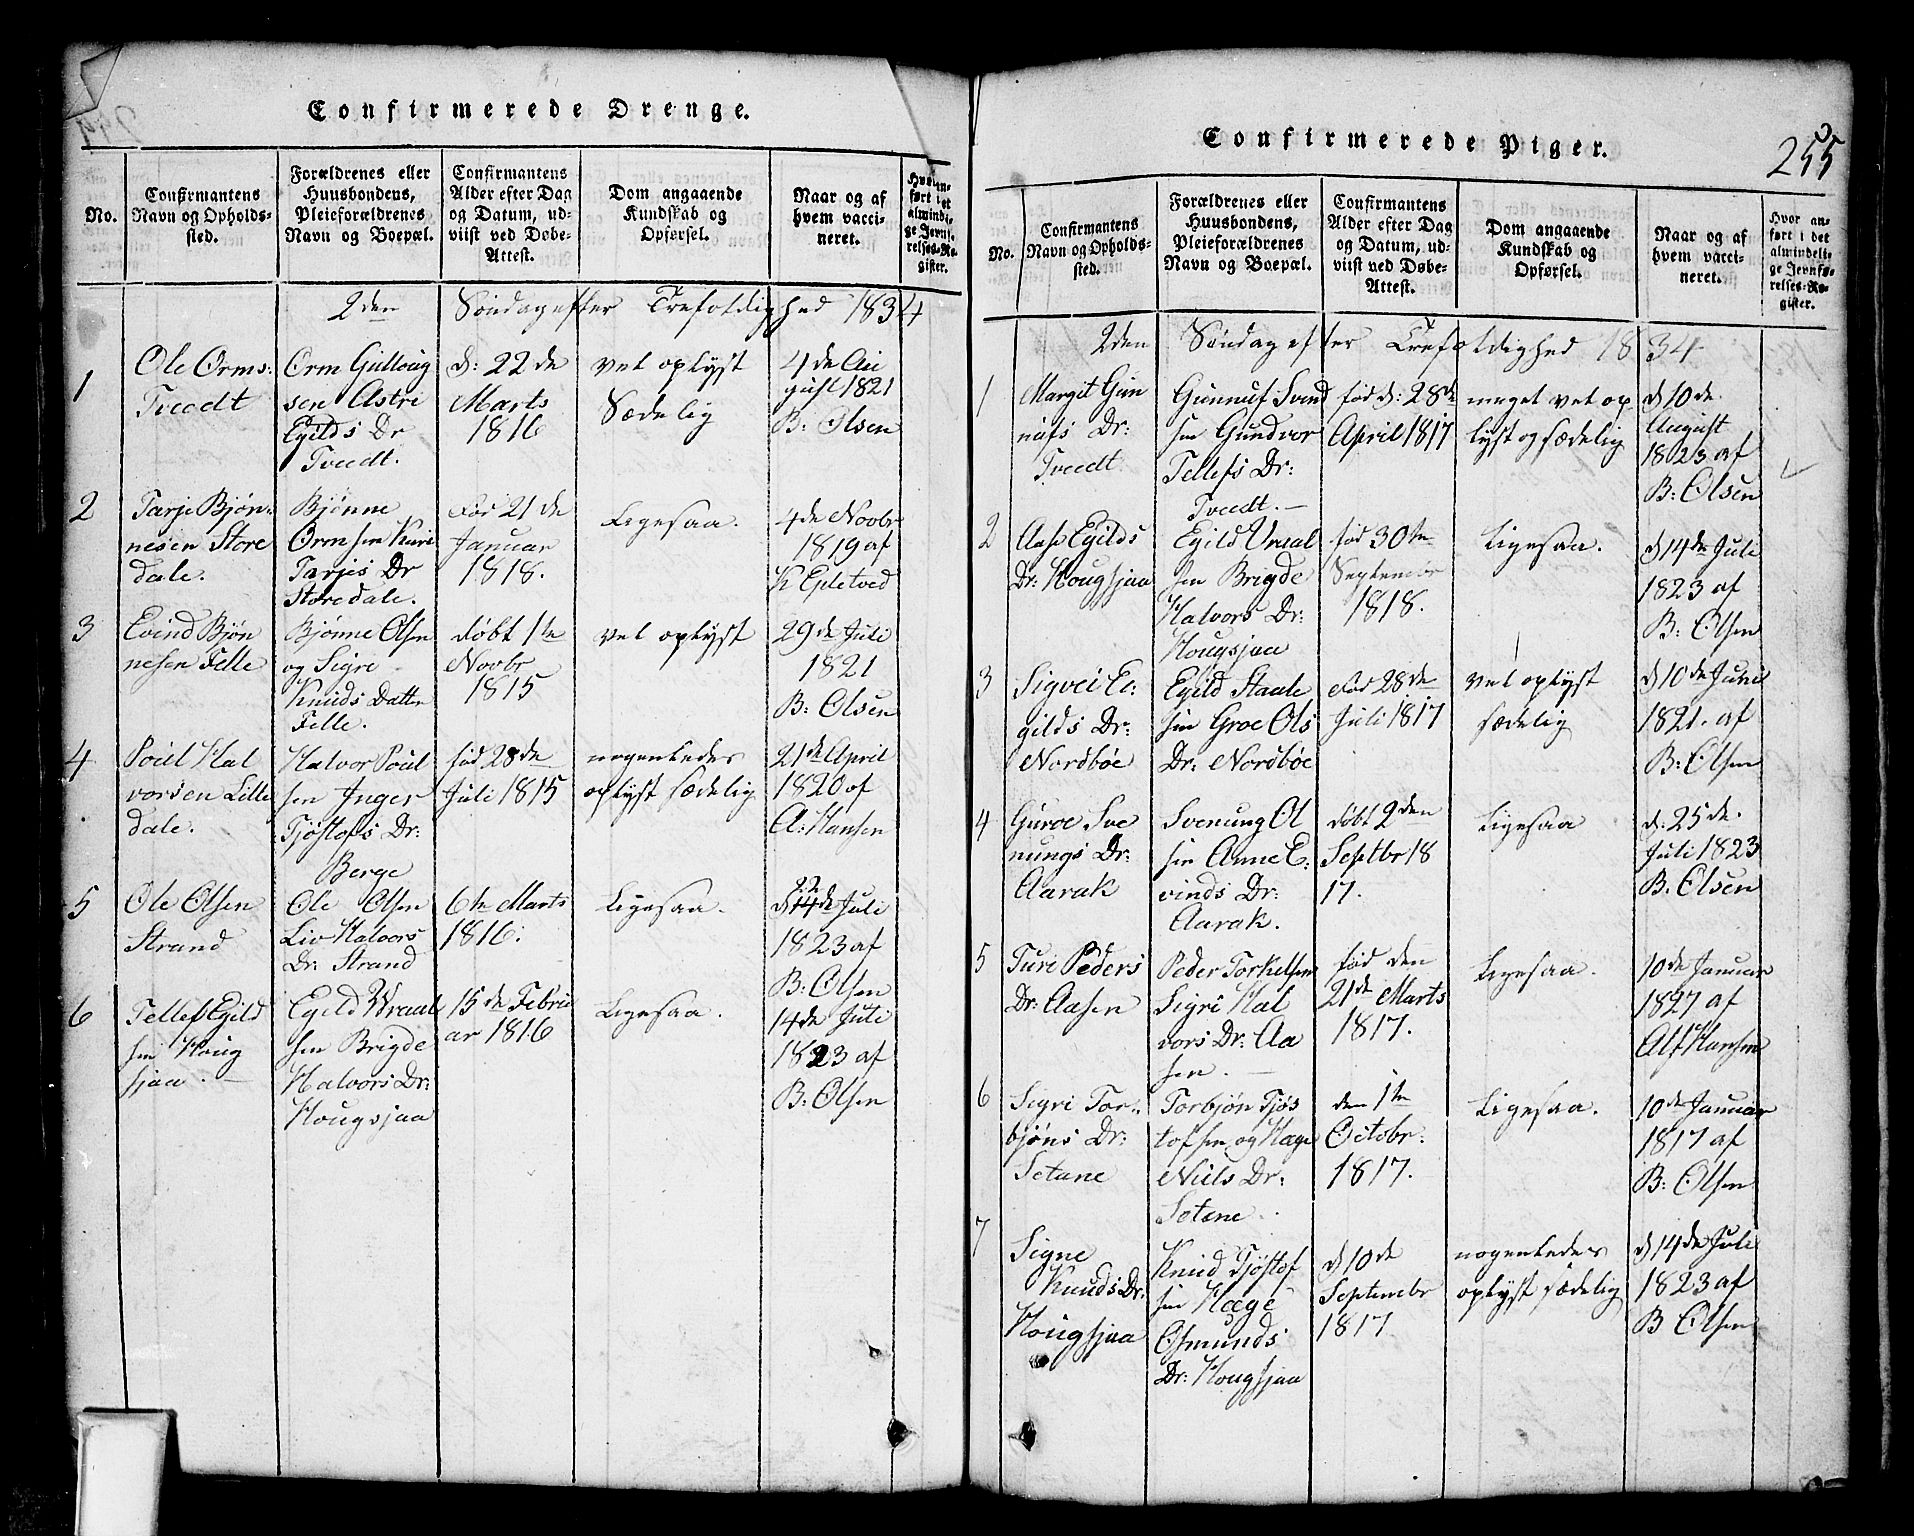 SAKO, Nissedal kirkebøker, G/Gb/L0001: Klokkerbok nr. II 1, 1814-1862, s. 255